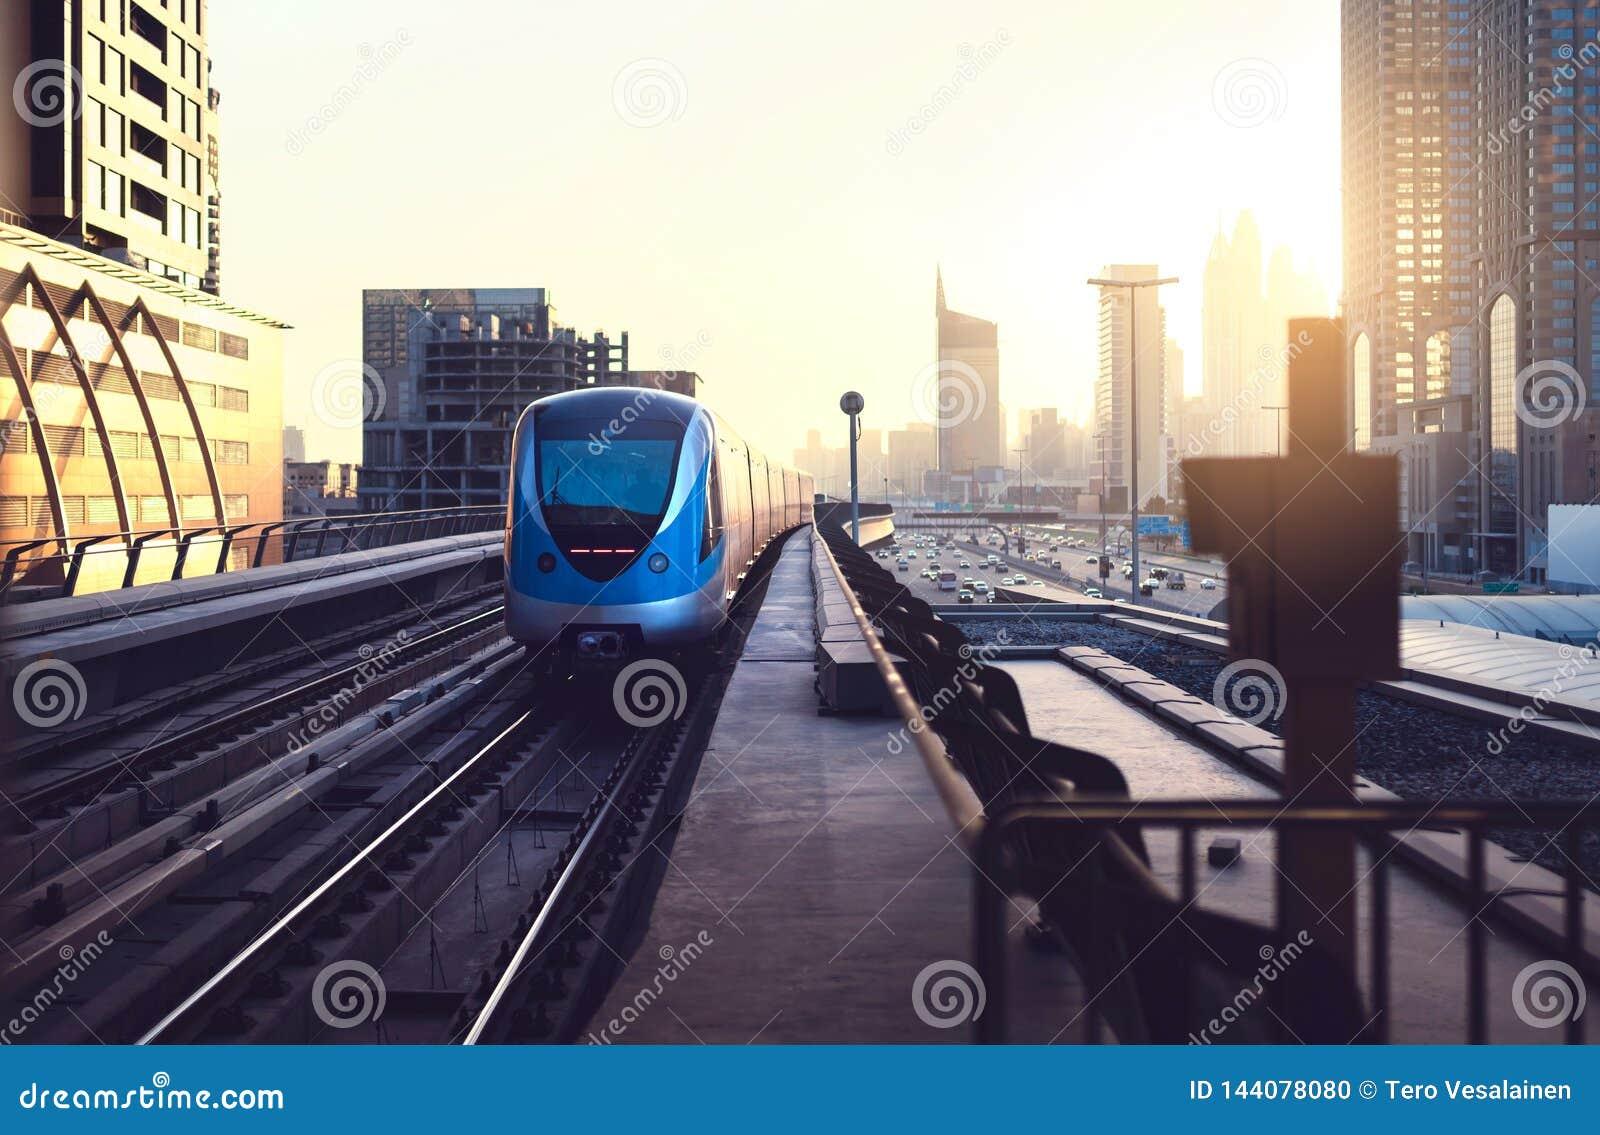 Subway Train At Sunset In Modern City Dubai Metro Downtown